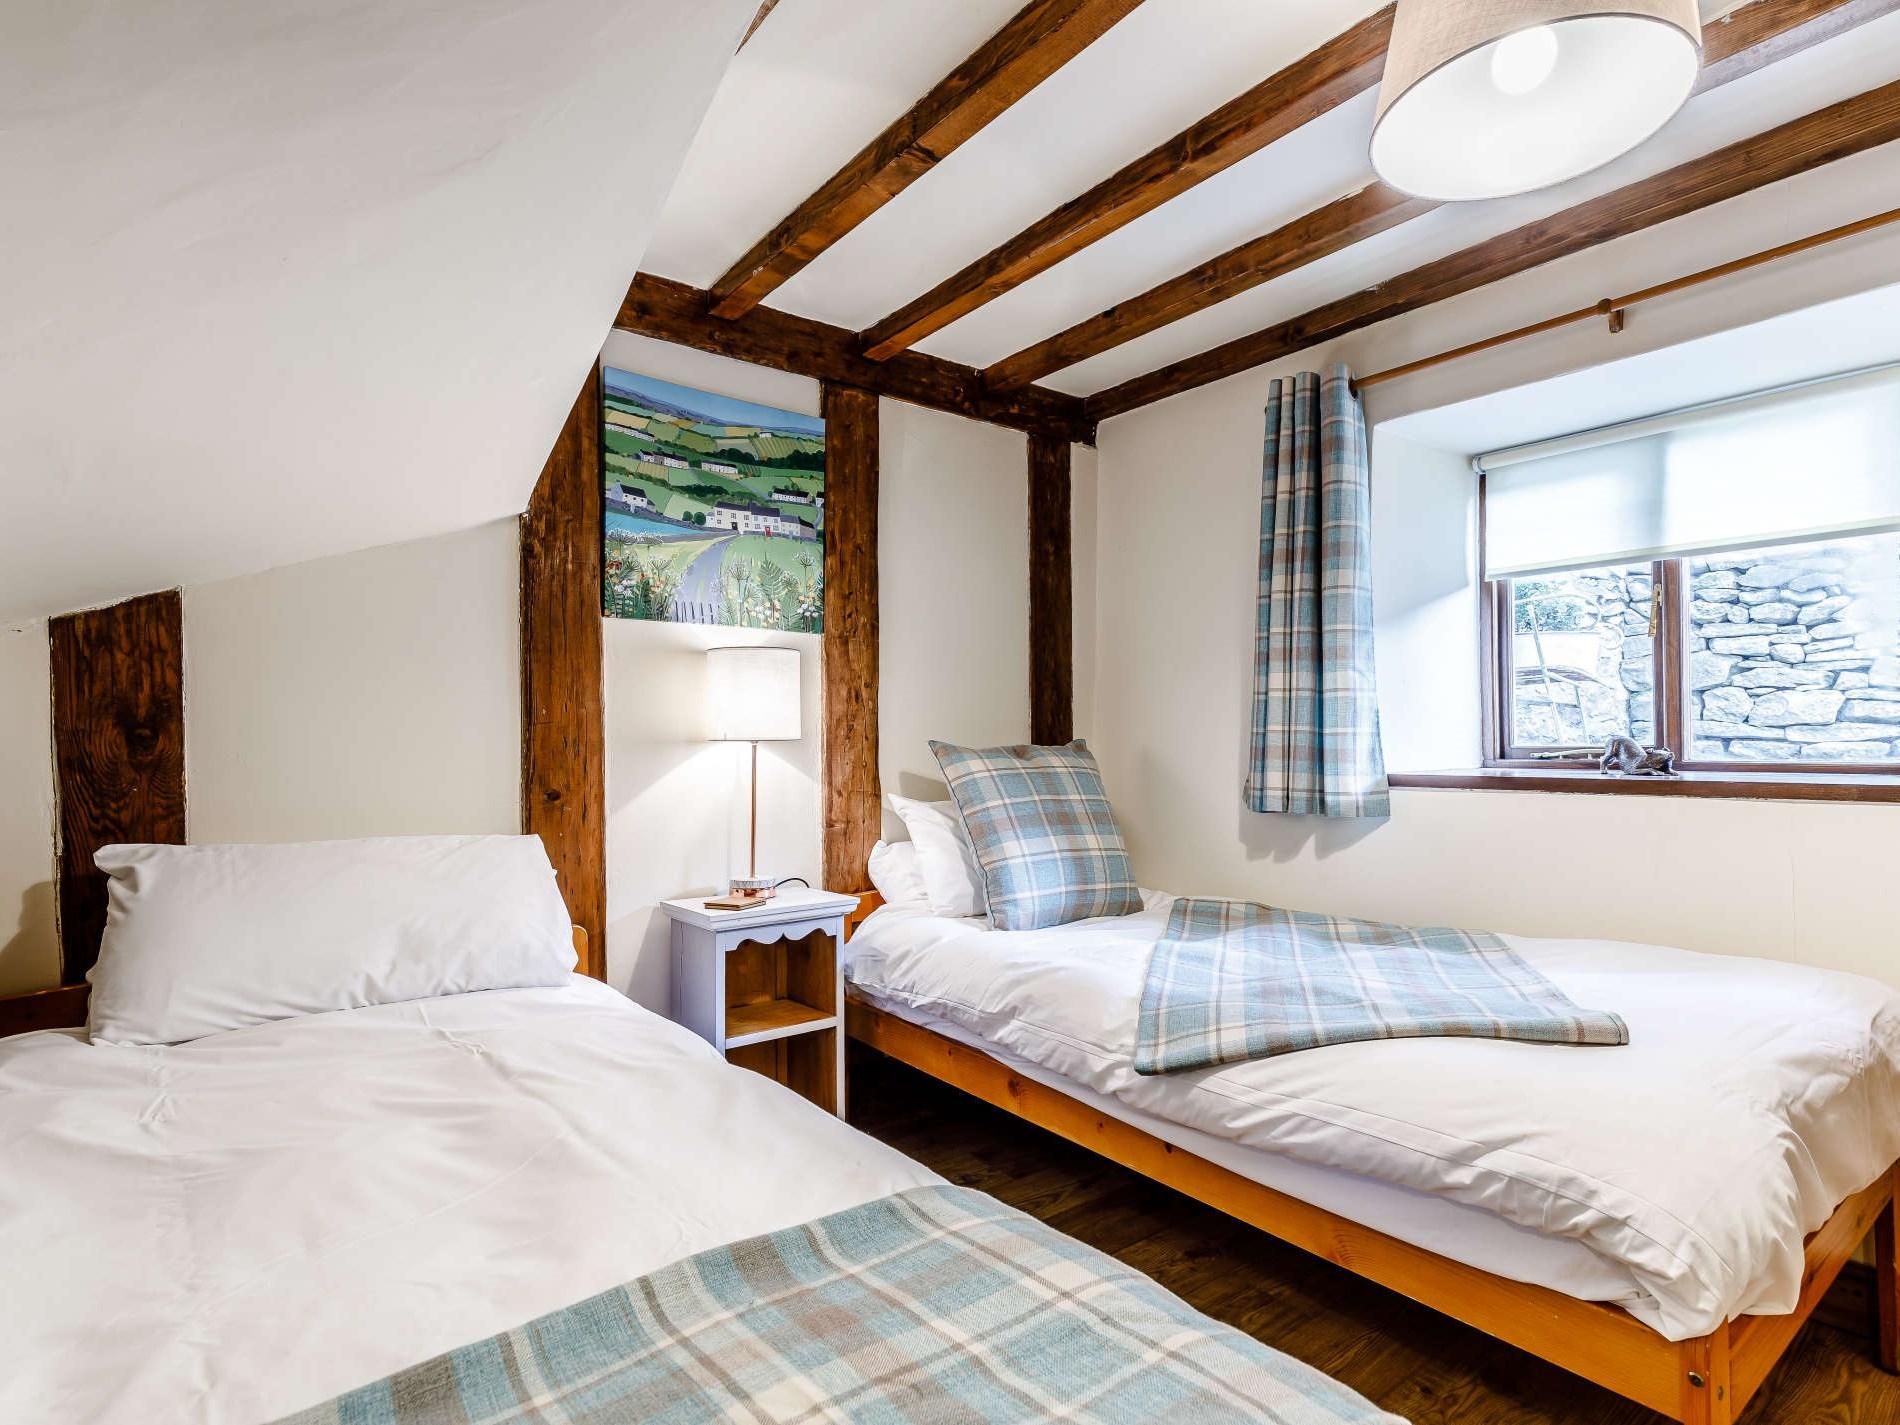 2 Bedroom Cottage in Buxton, Peak District